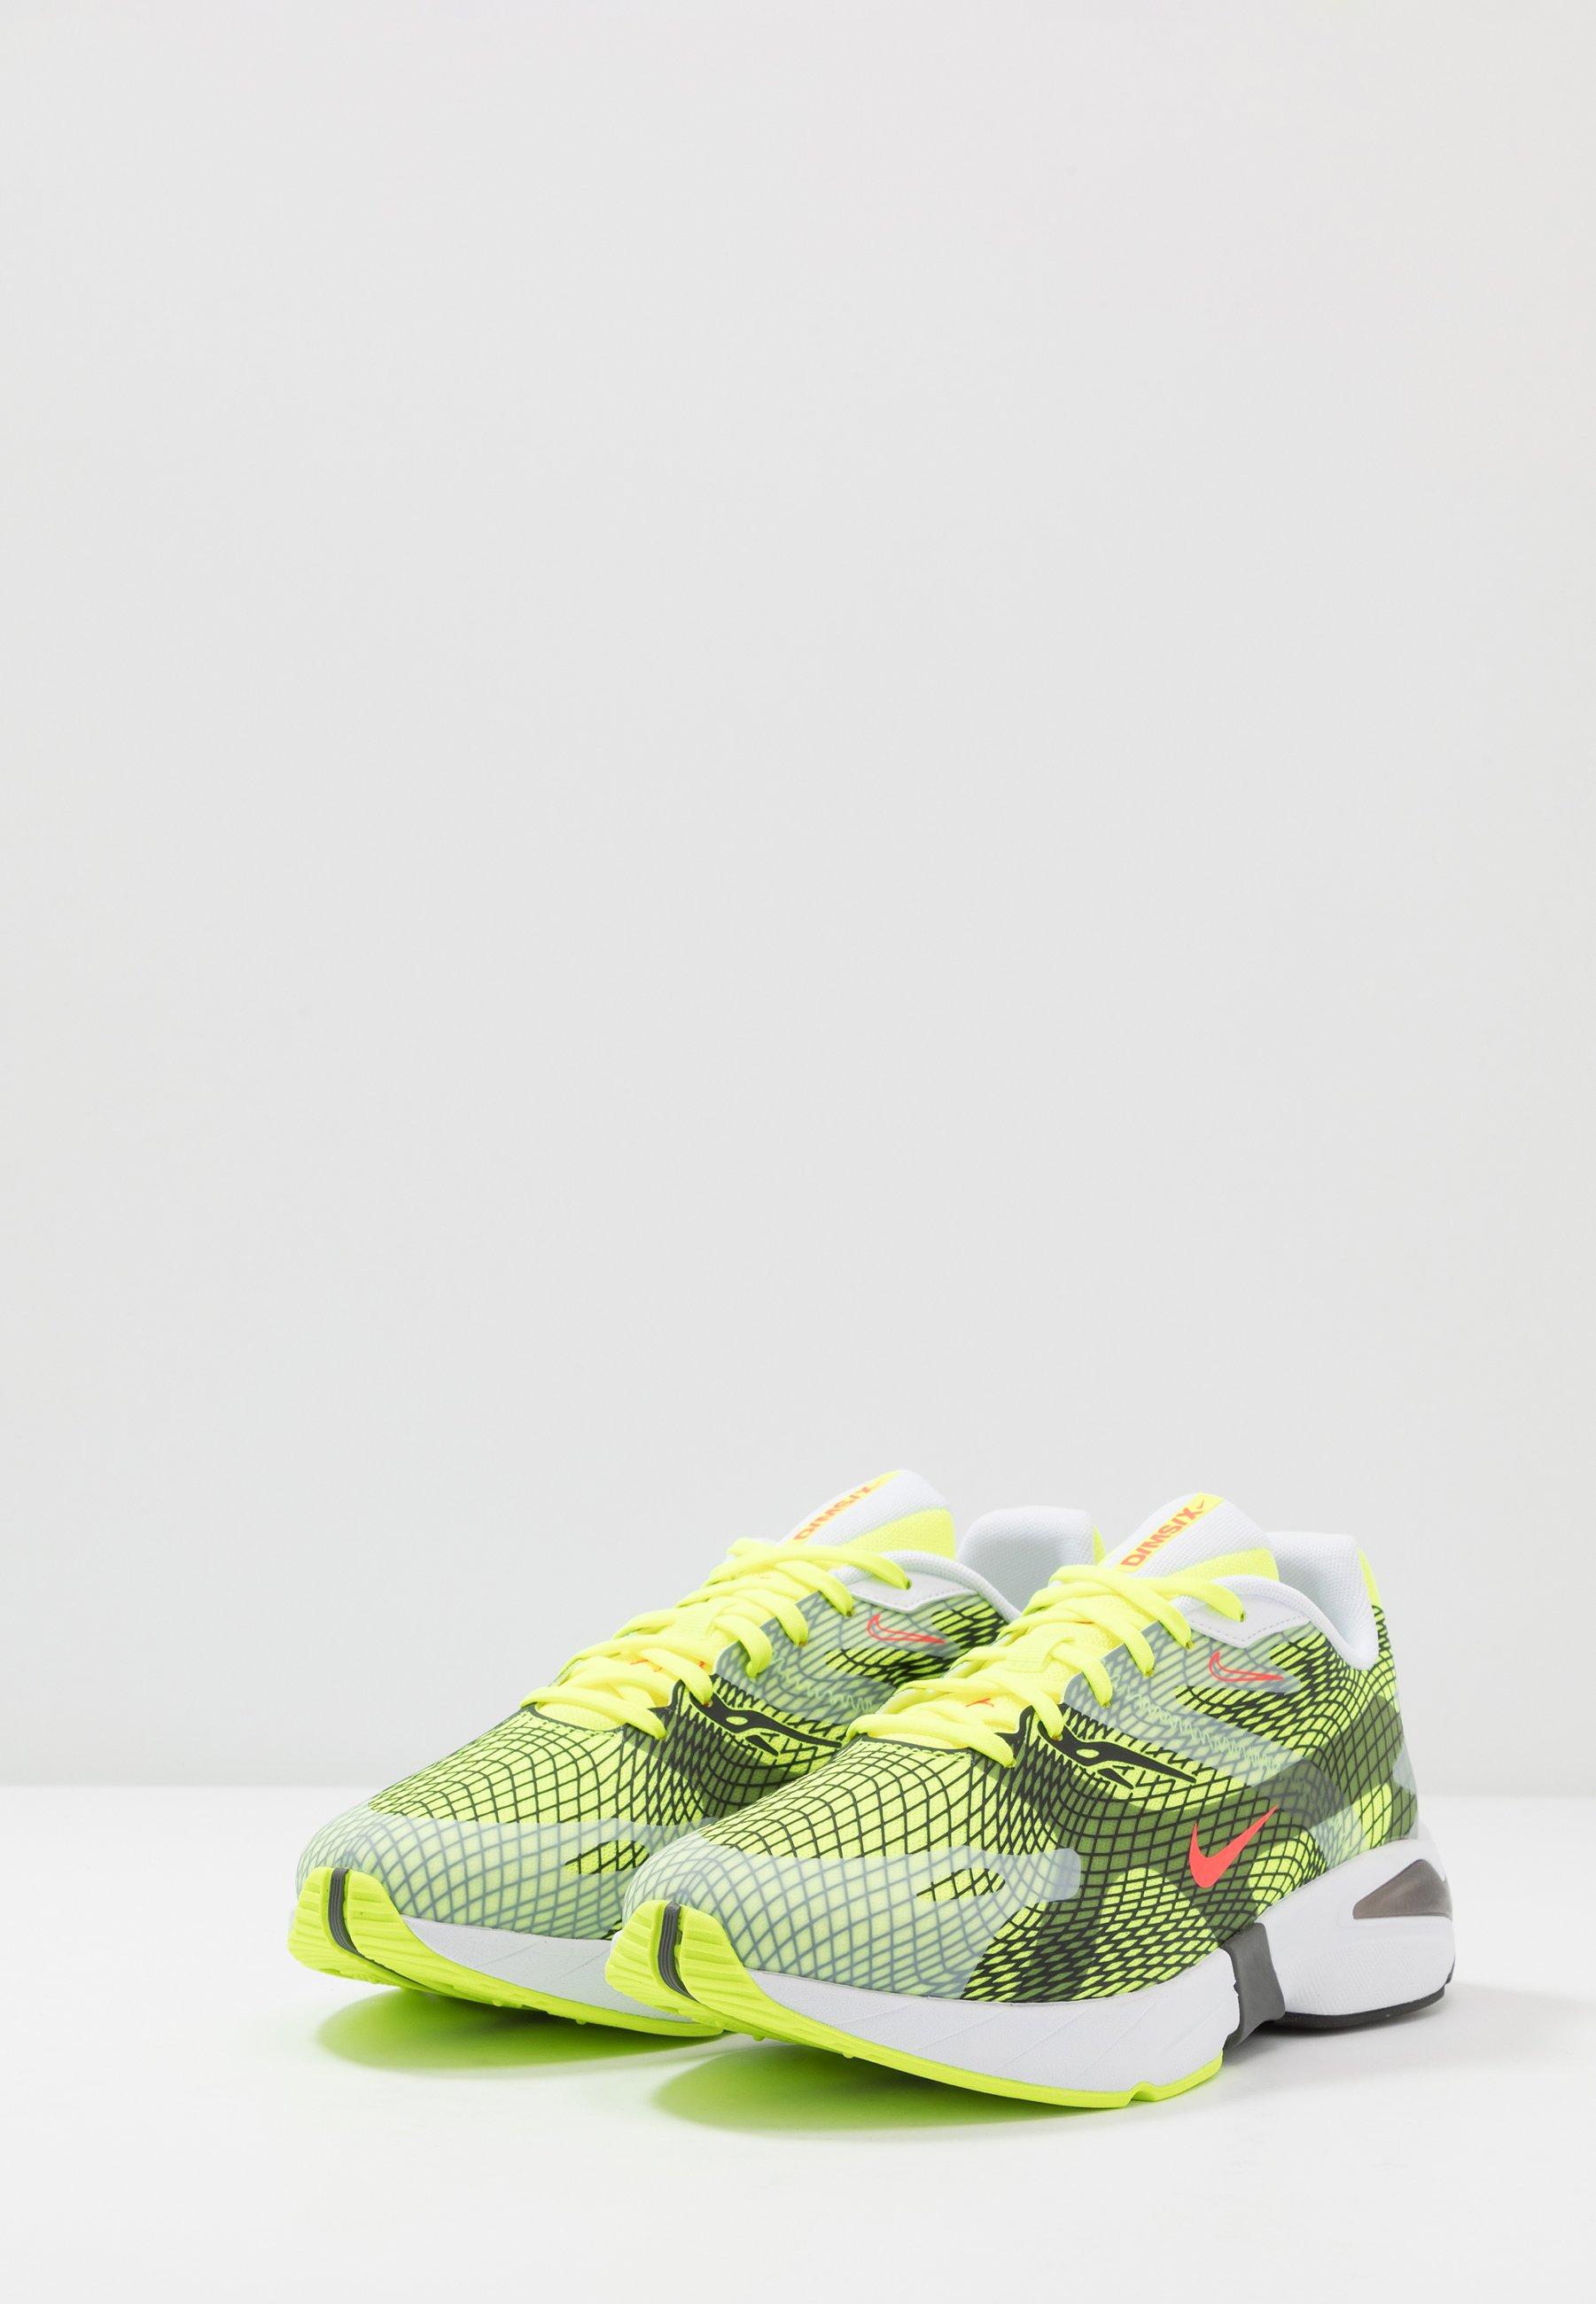 Nike Sportswear Ghoswift - Trainers Volt/laser Crimson/white/iron Grey/black